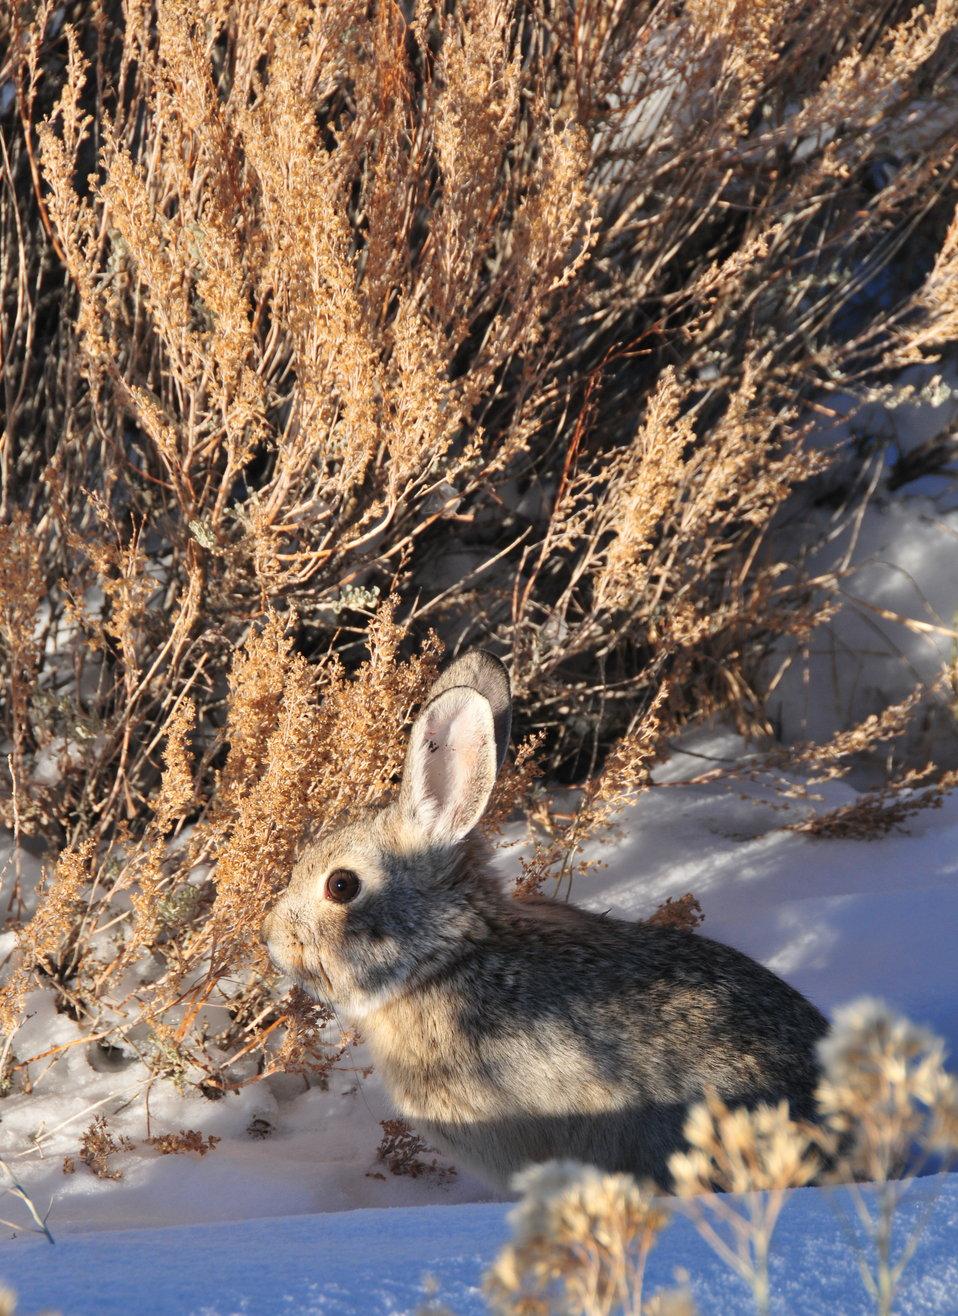 Pygmy Rabbit (Sylvilagus idahoensis) Seedskadee NWR 02